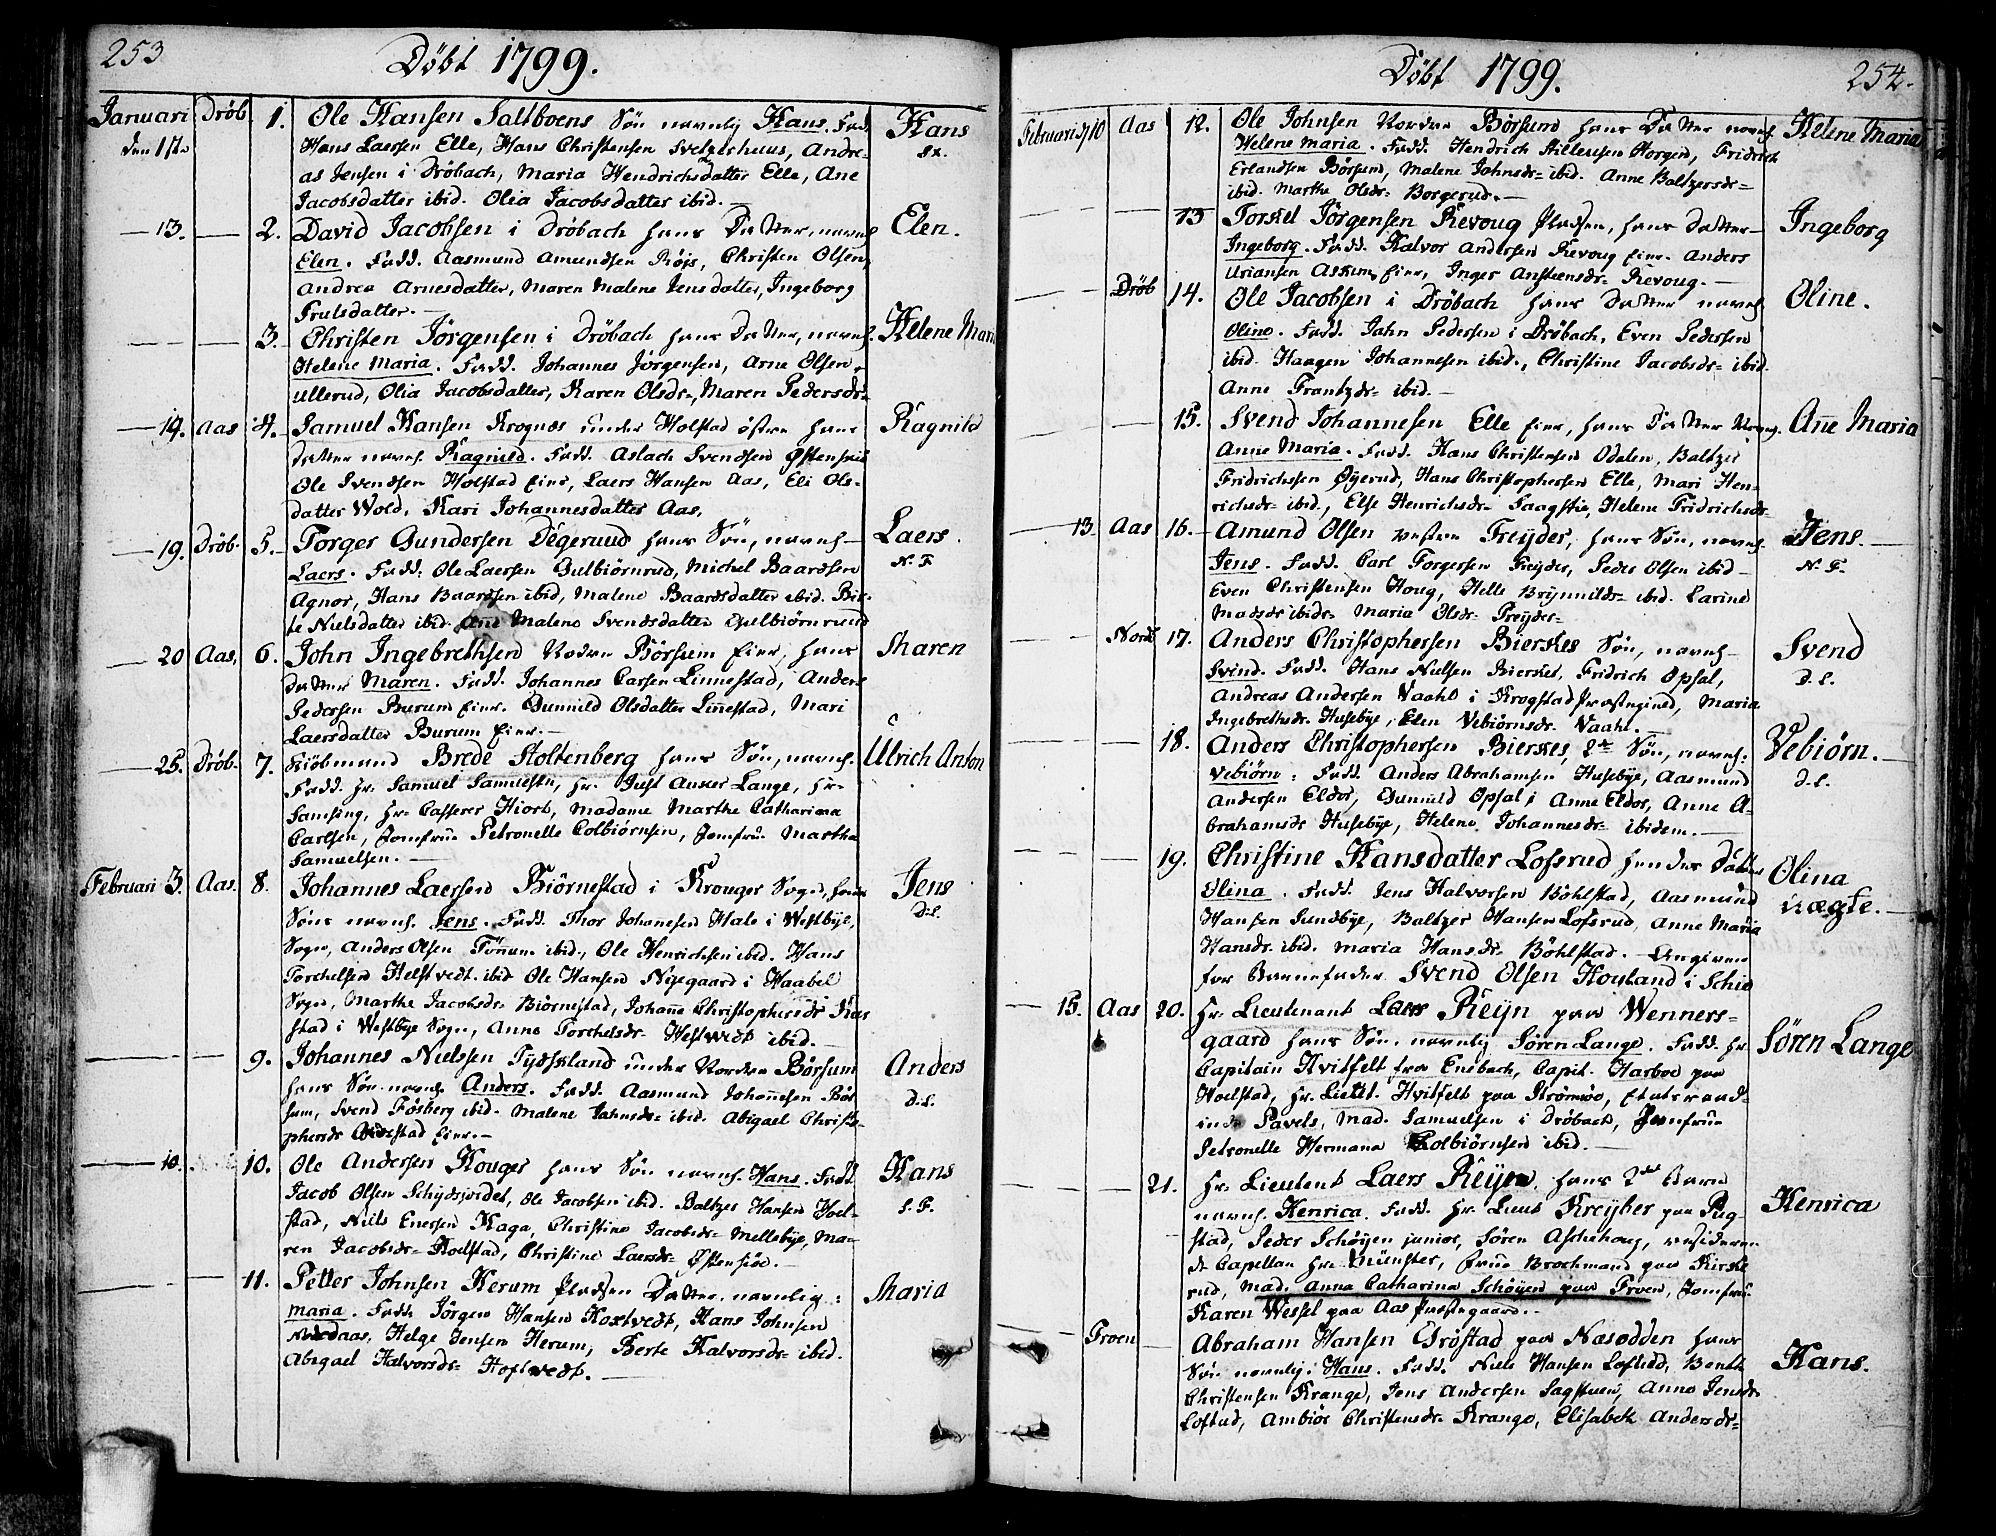 SAO, Ås prestekontor Kirkebøker, F/Fa/L0002: Ministerialbok nr. I 2, 1778-1813, s. 253-254